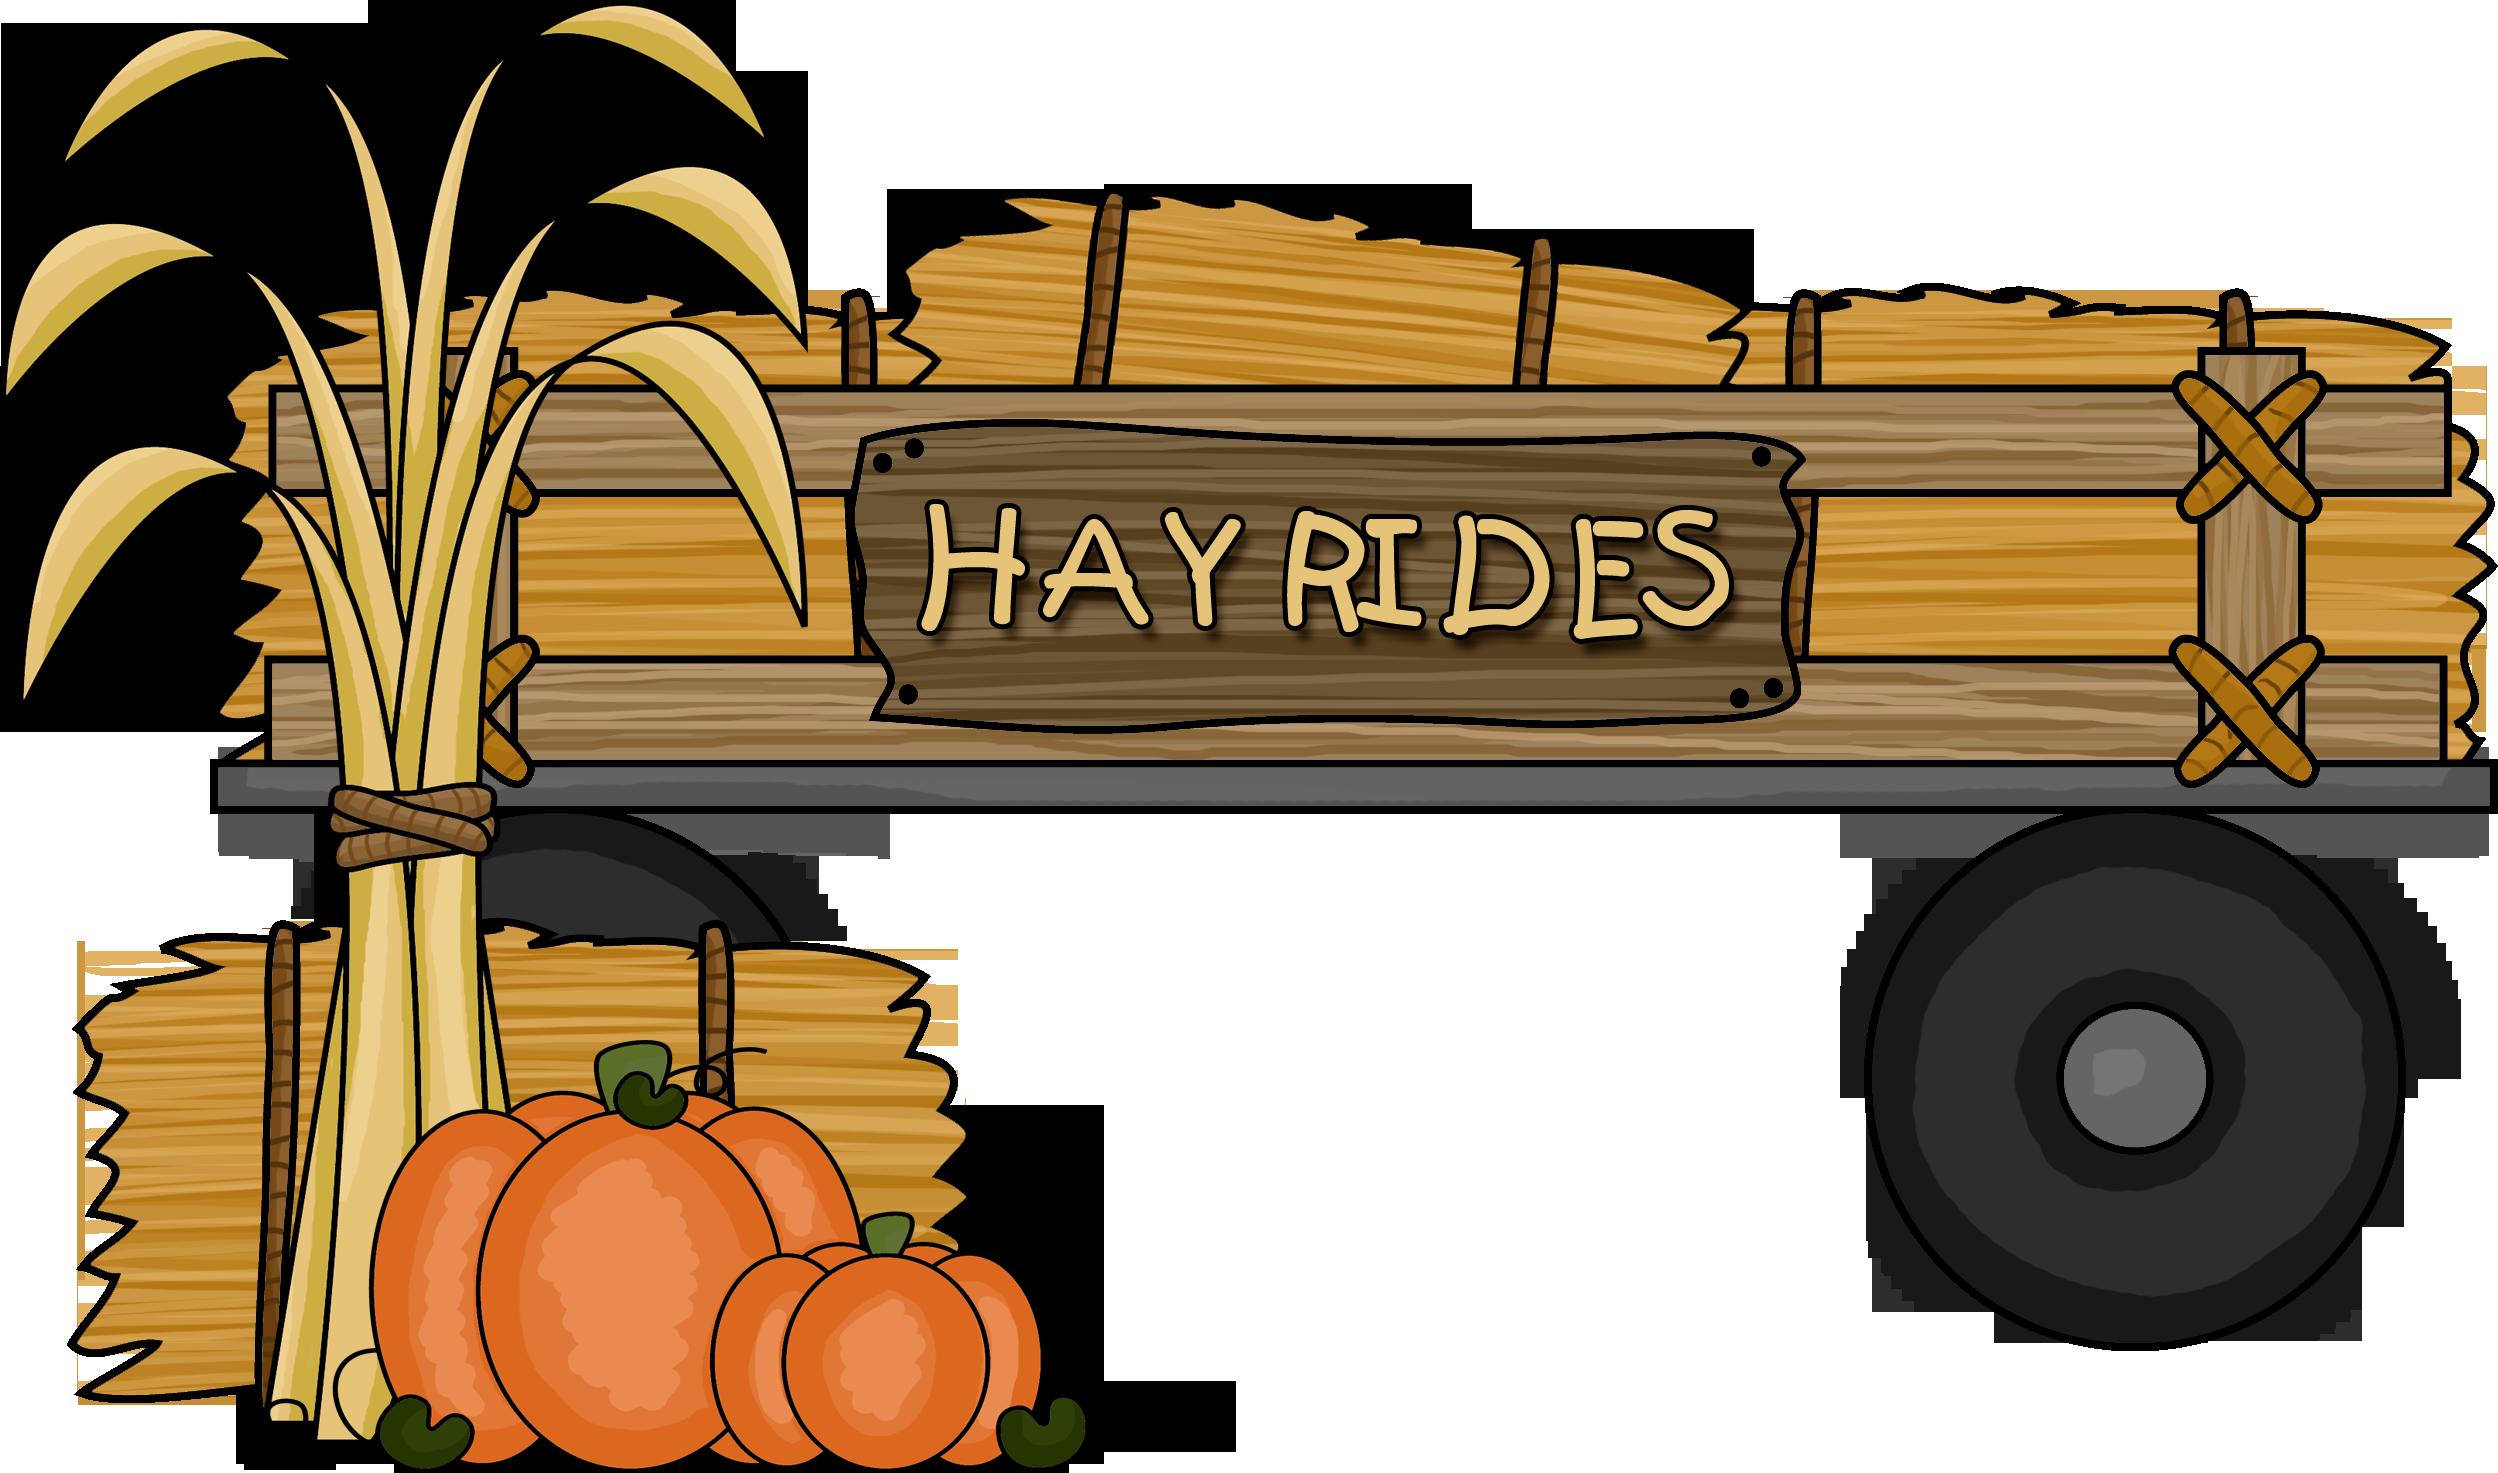 Pumpkin truck clipart svg library download Hayride clipart - Clipground svg library download